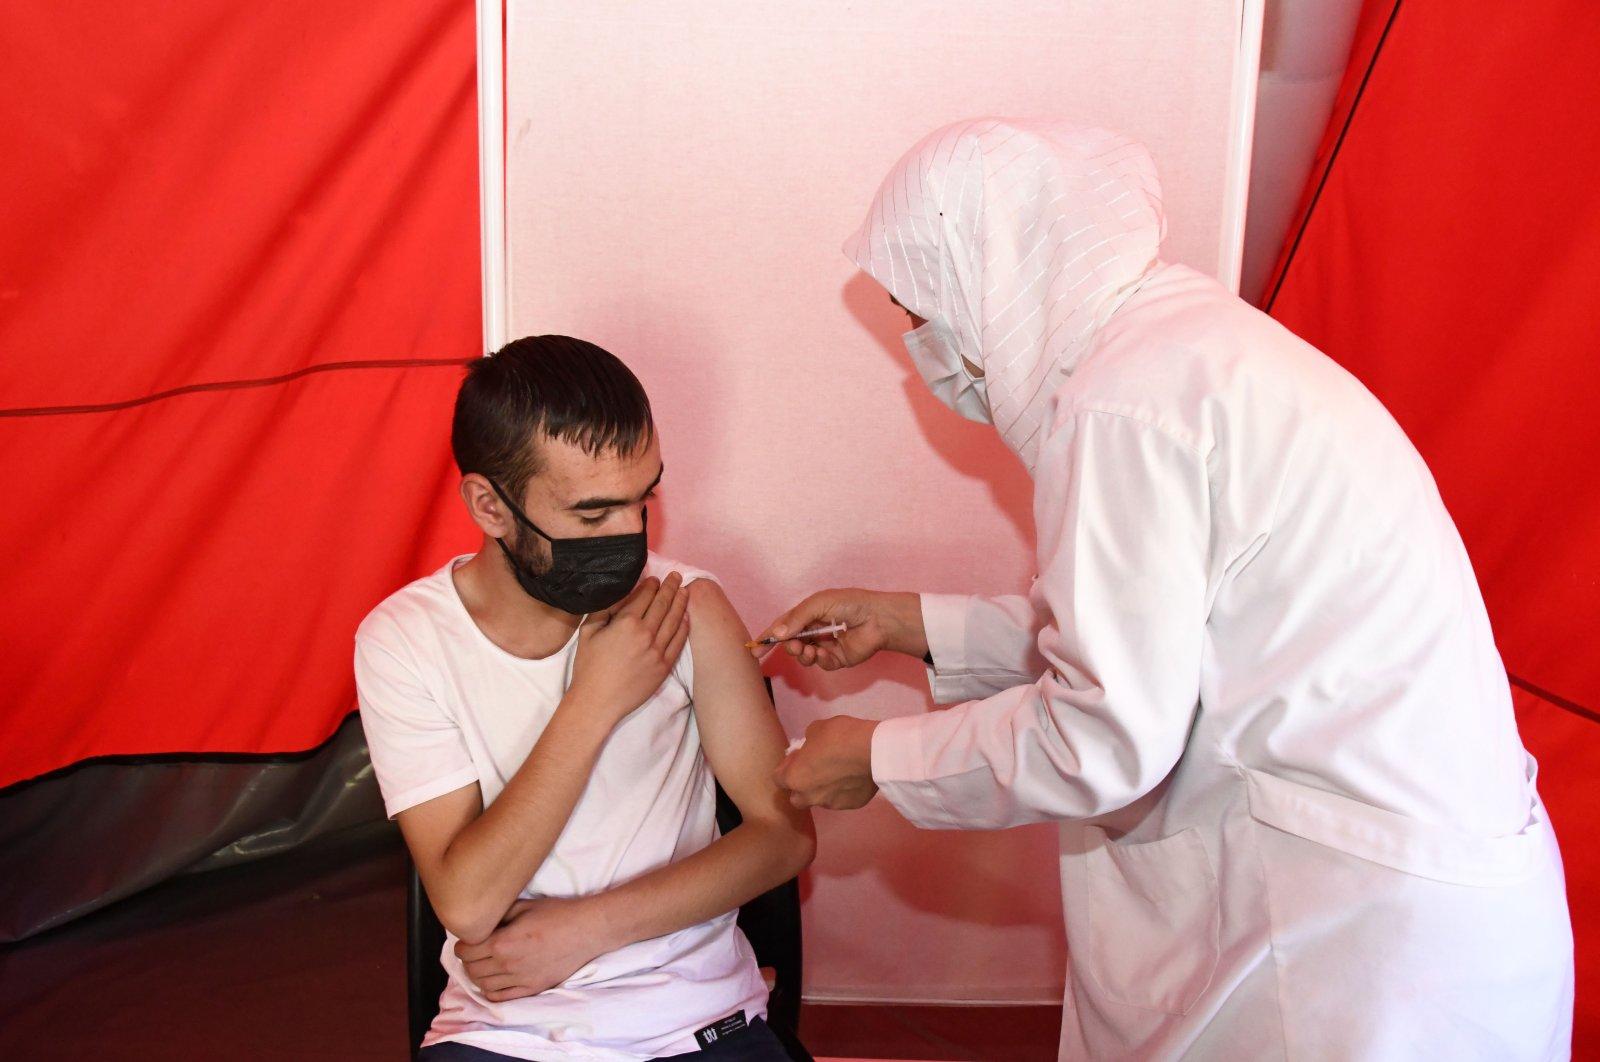 A nurse vaccinate a man at a vaccination tent, in Gümüşhane, northern Turkey, Sept. 15, 2021. (AA PHOTO)